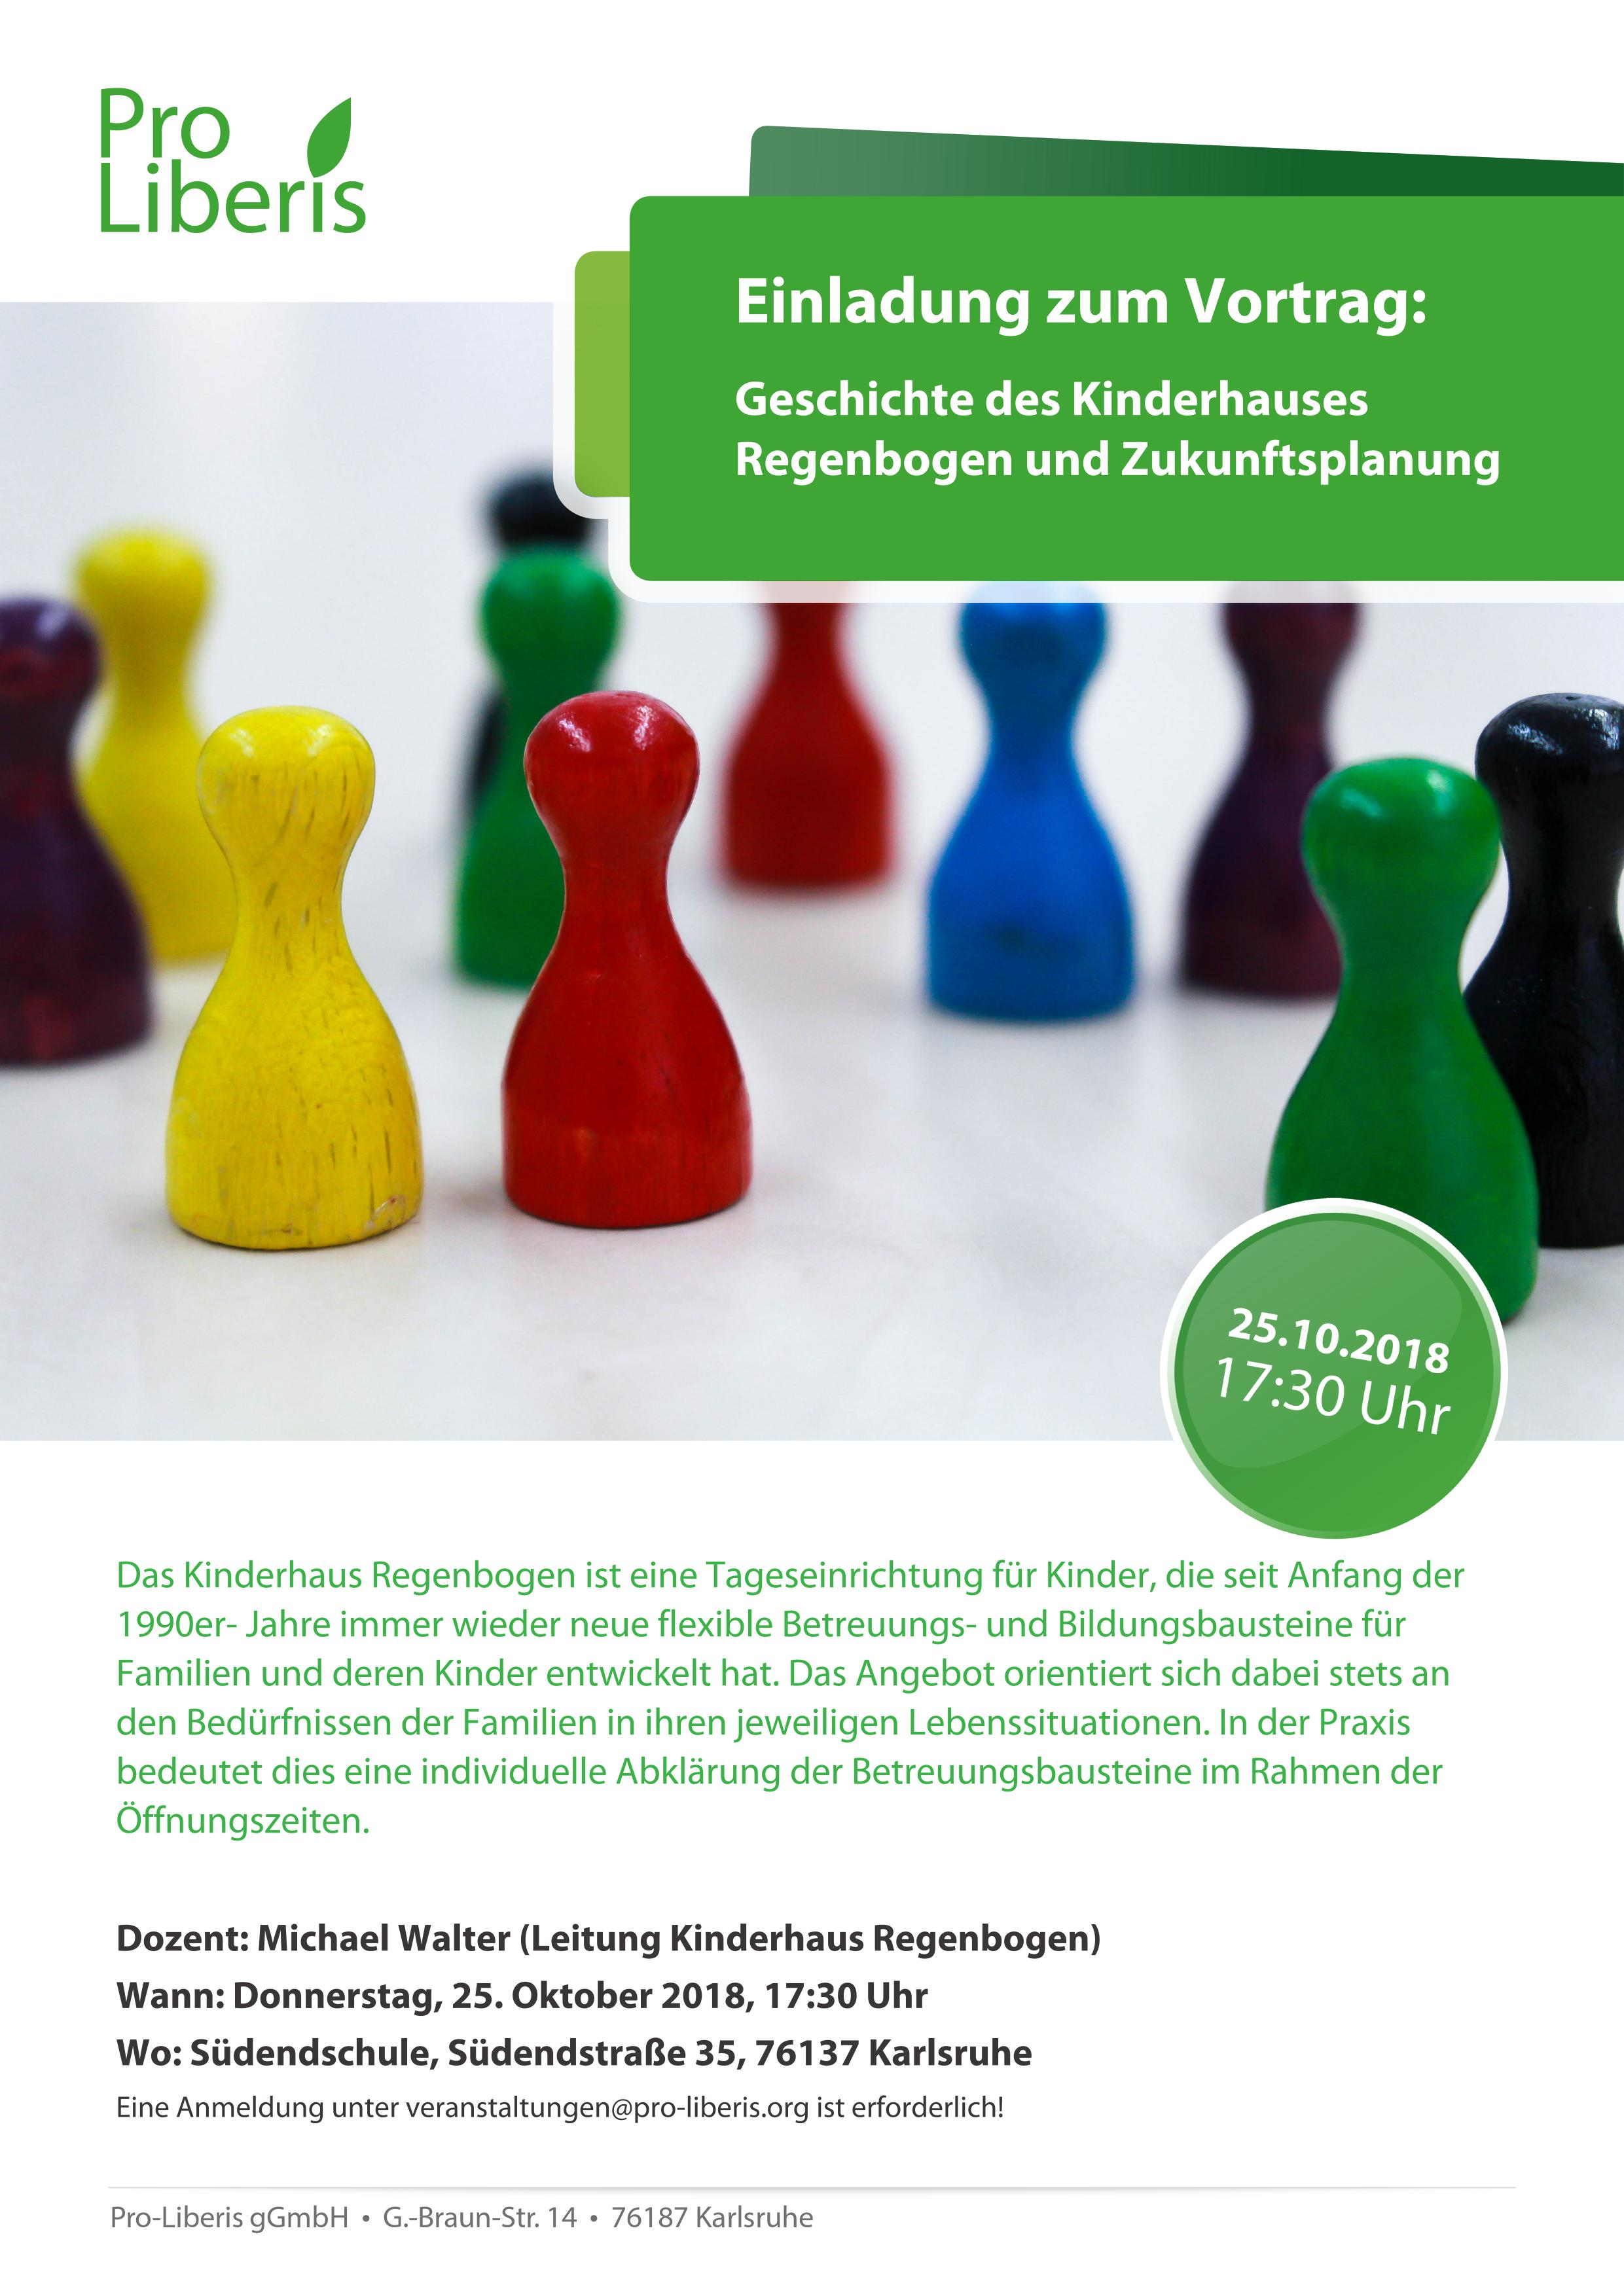 Vortrag über das Kinderhaus Regenbogen Karlsruhe   Pro-Liberis